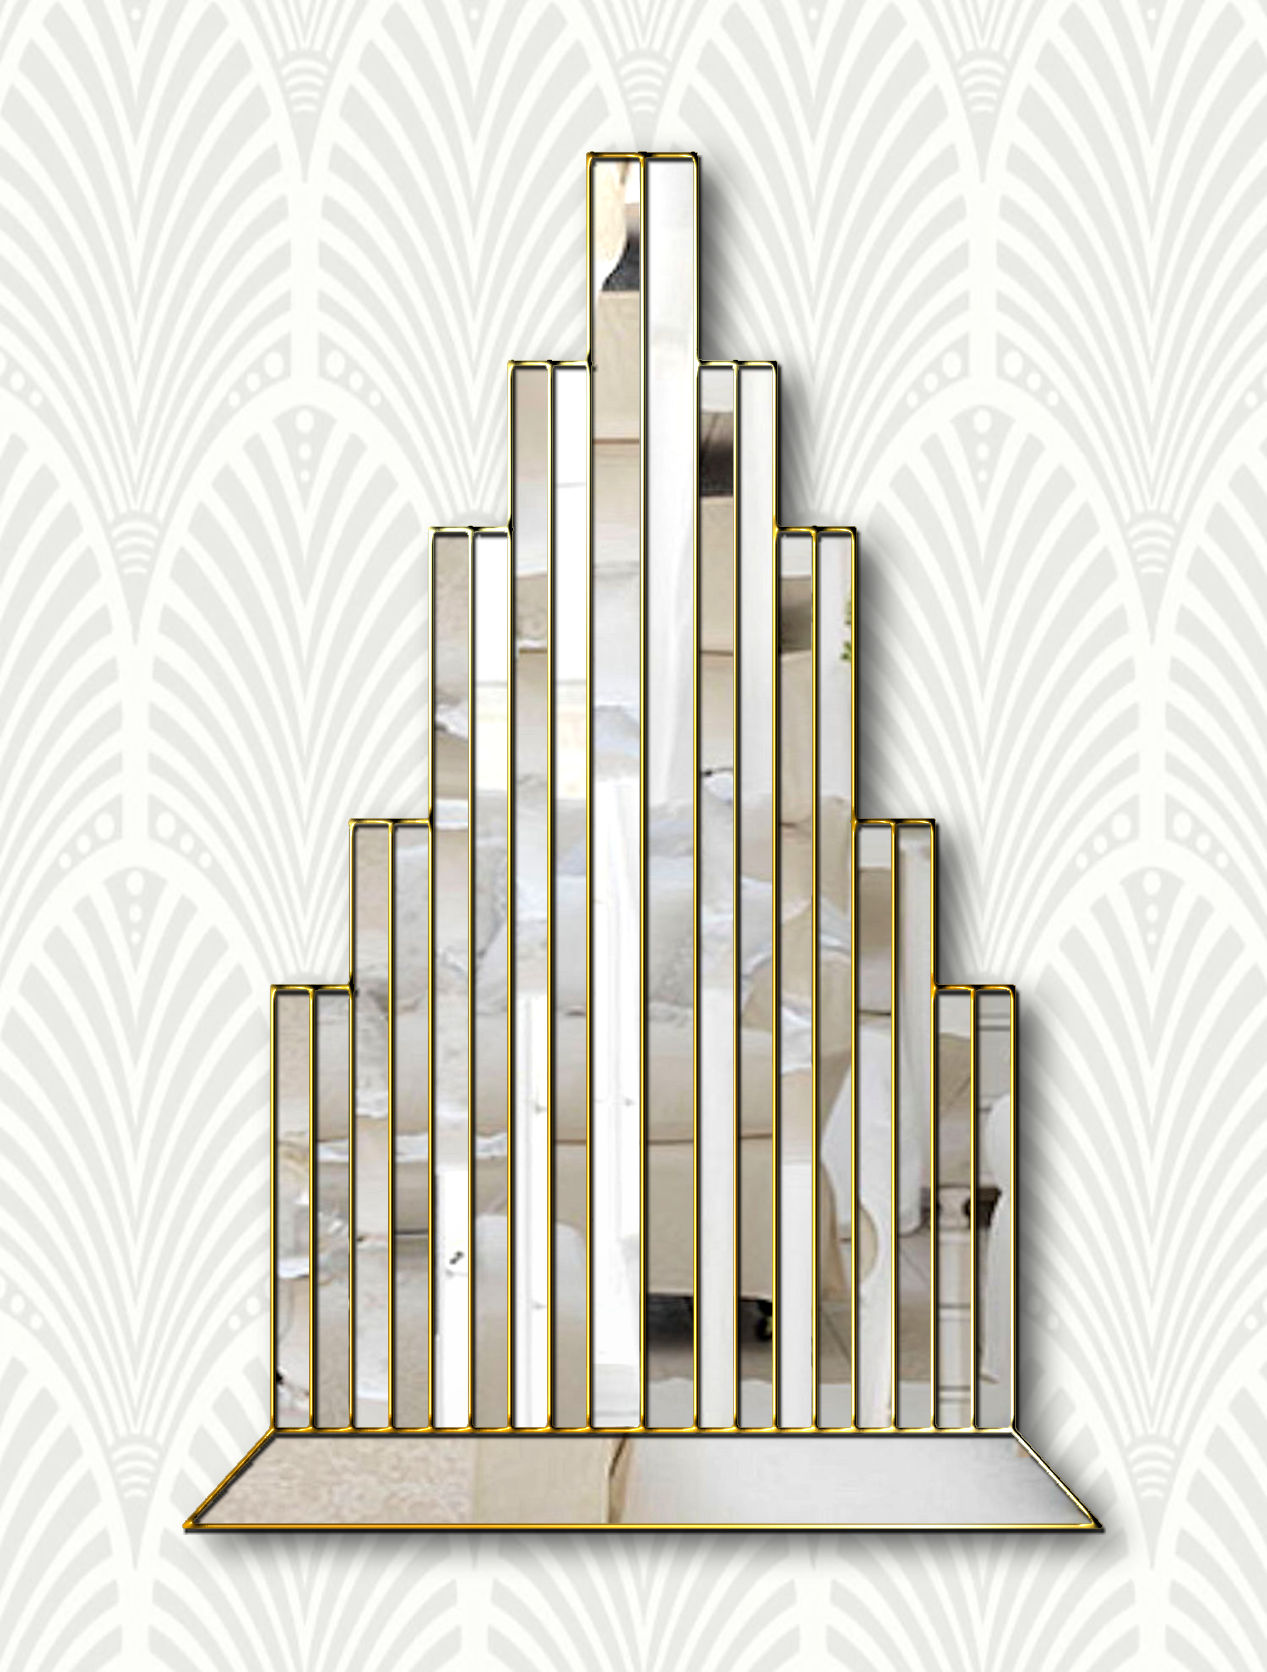 New York Original Handcrafted Art Deco Wall Mirror With Gold Trim Bespoke Mirrors Art Deco Mirrors Custom Made Mirrors